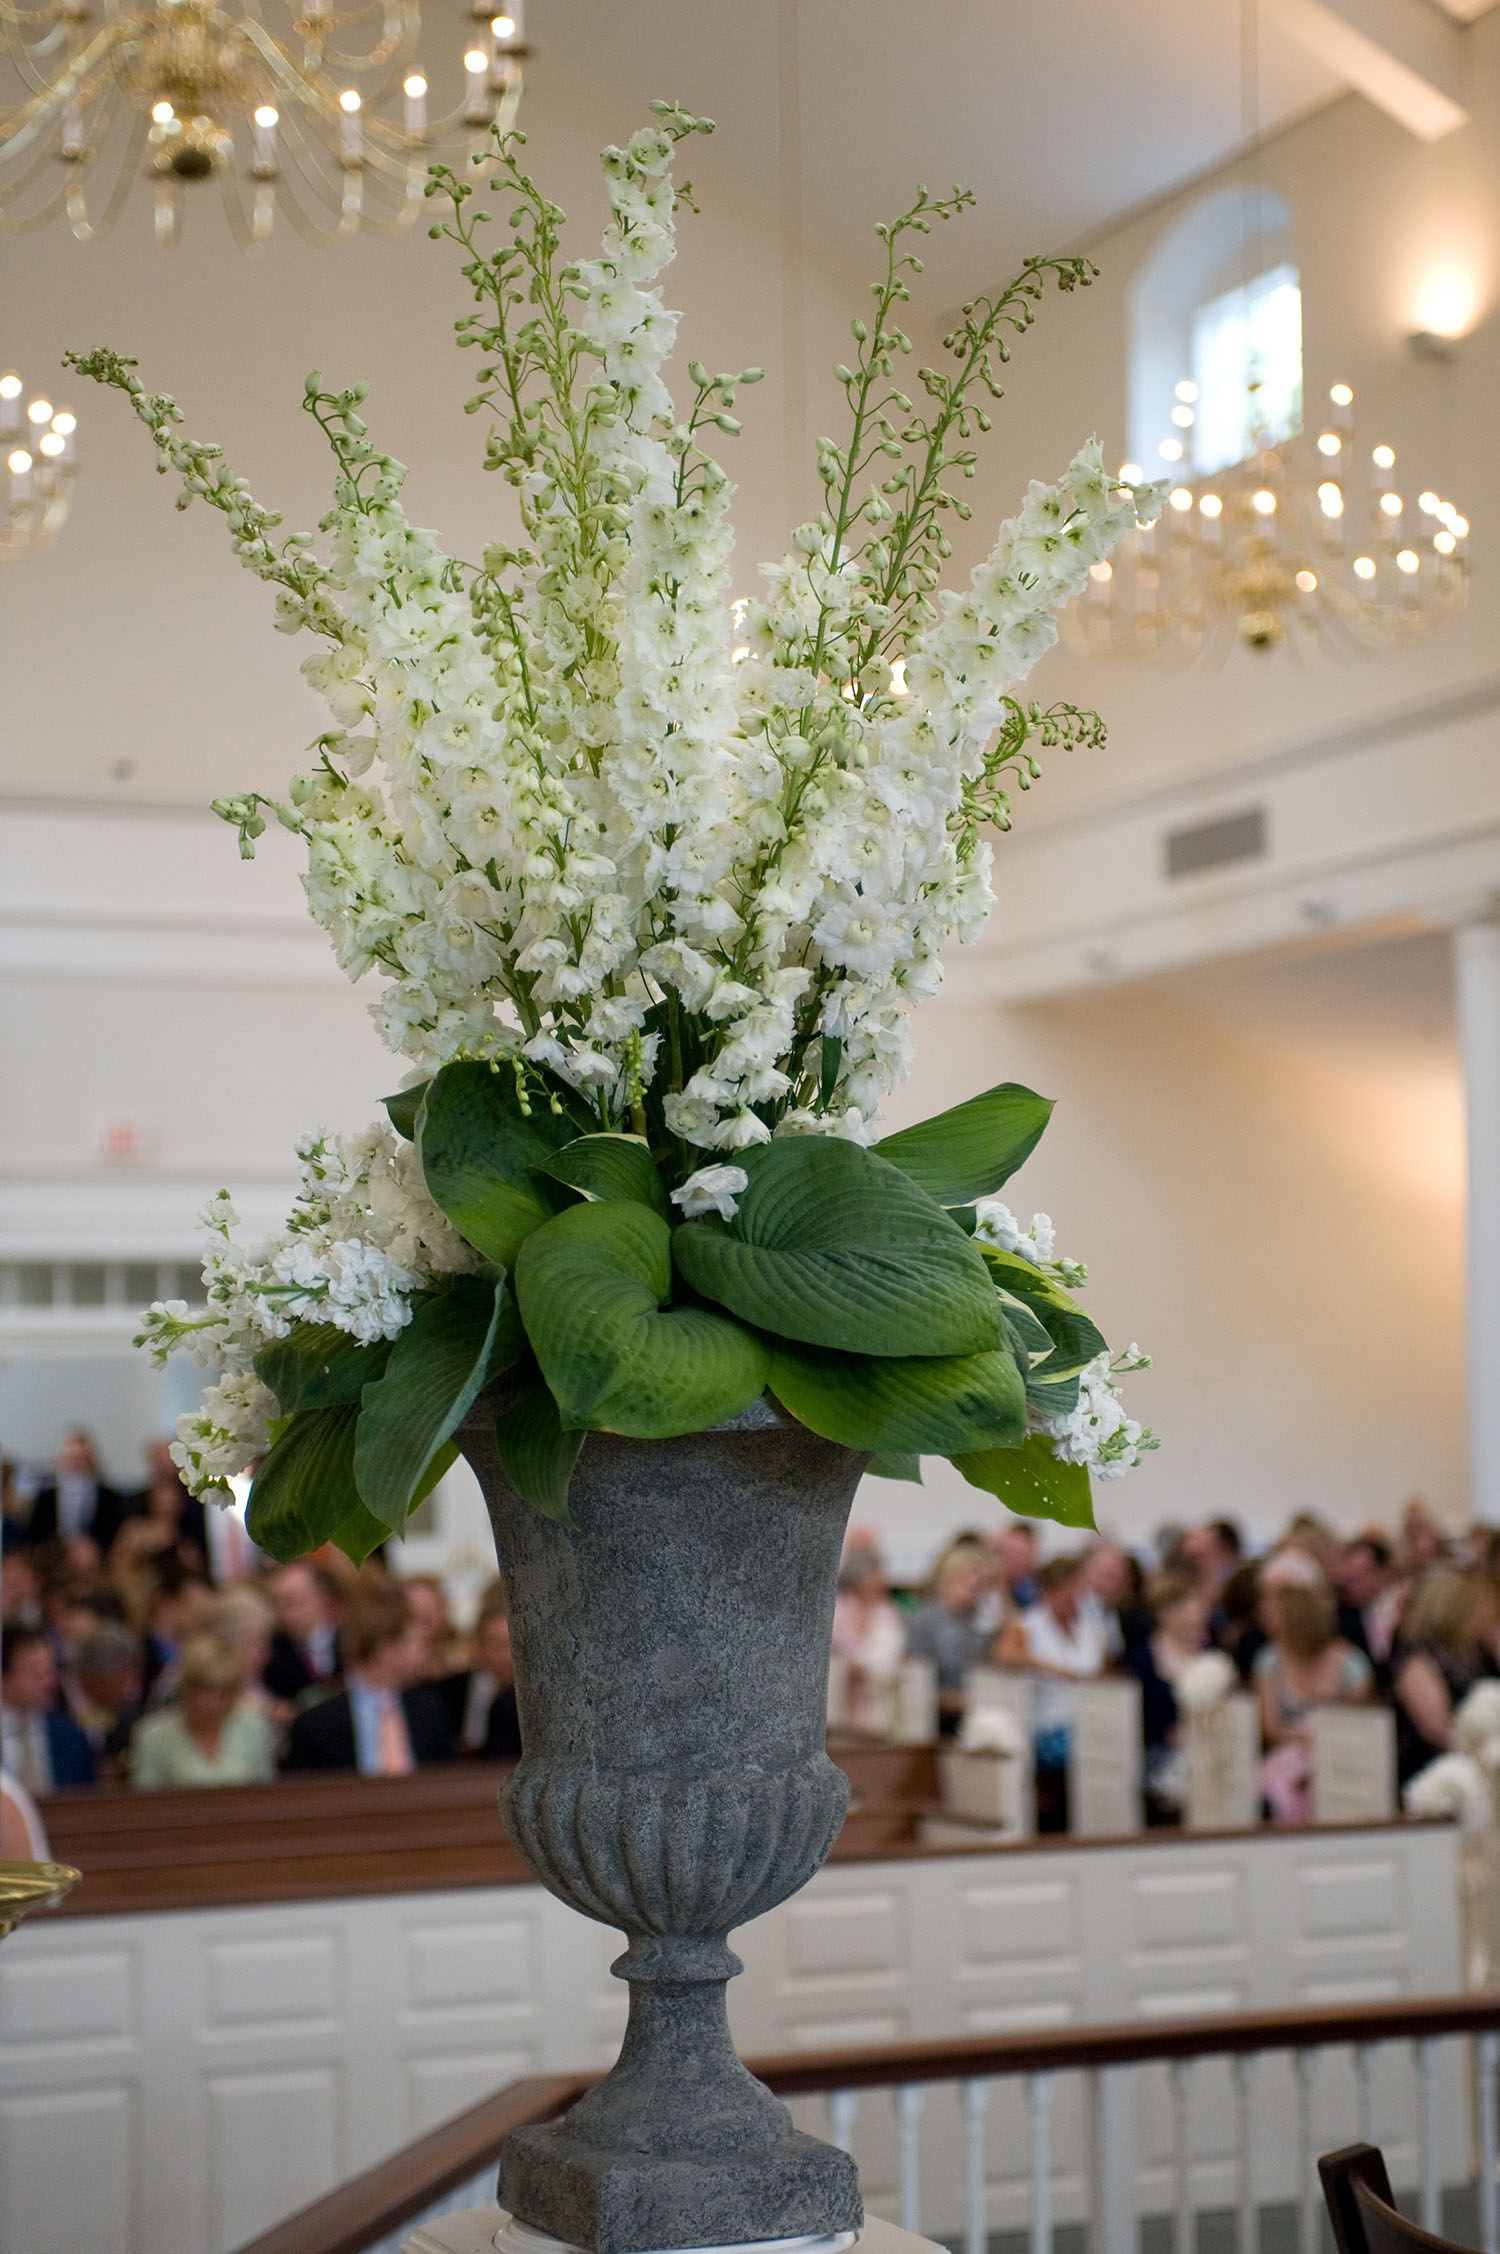 Joanne Bening Photography  | Wedding Ceremony | Gulph Mills Golf Club, King of Prussia, PA